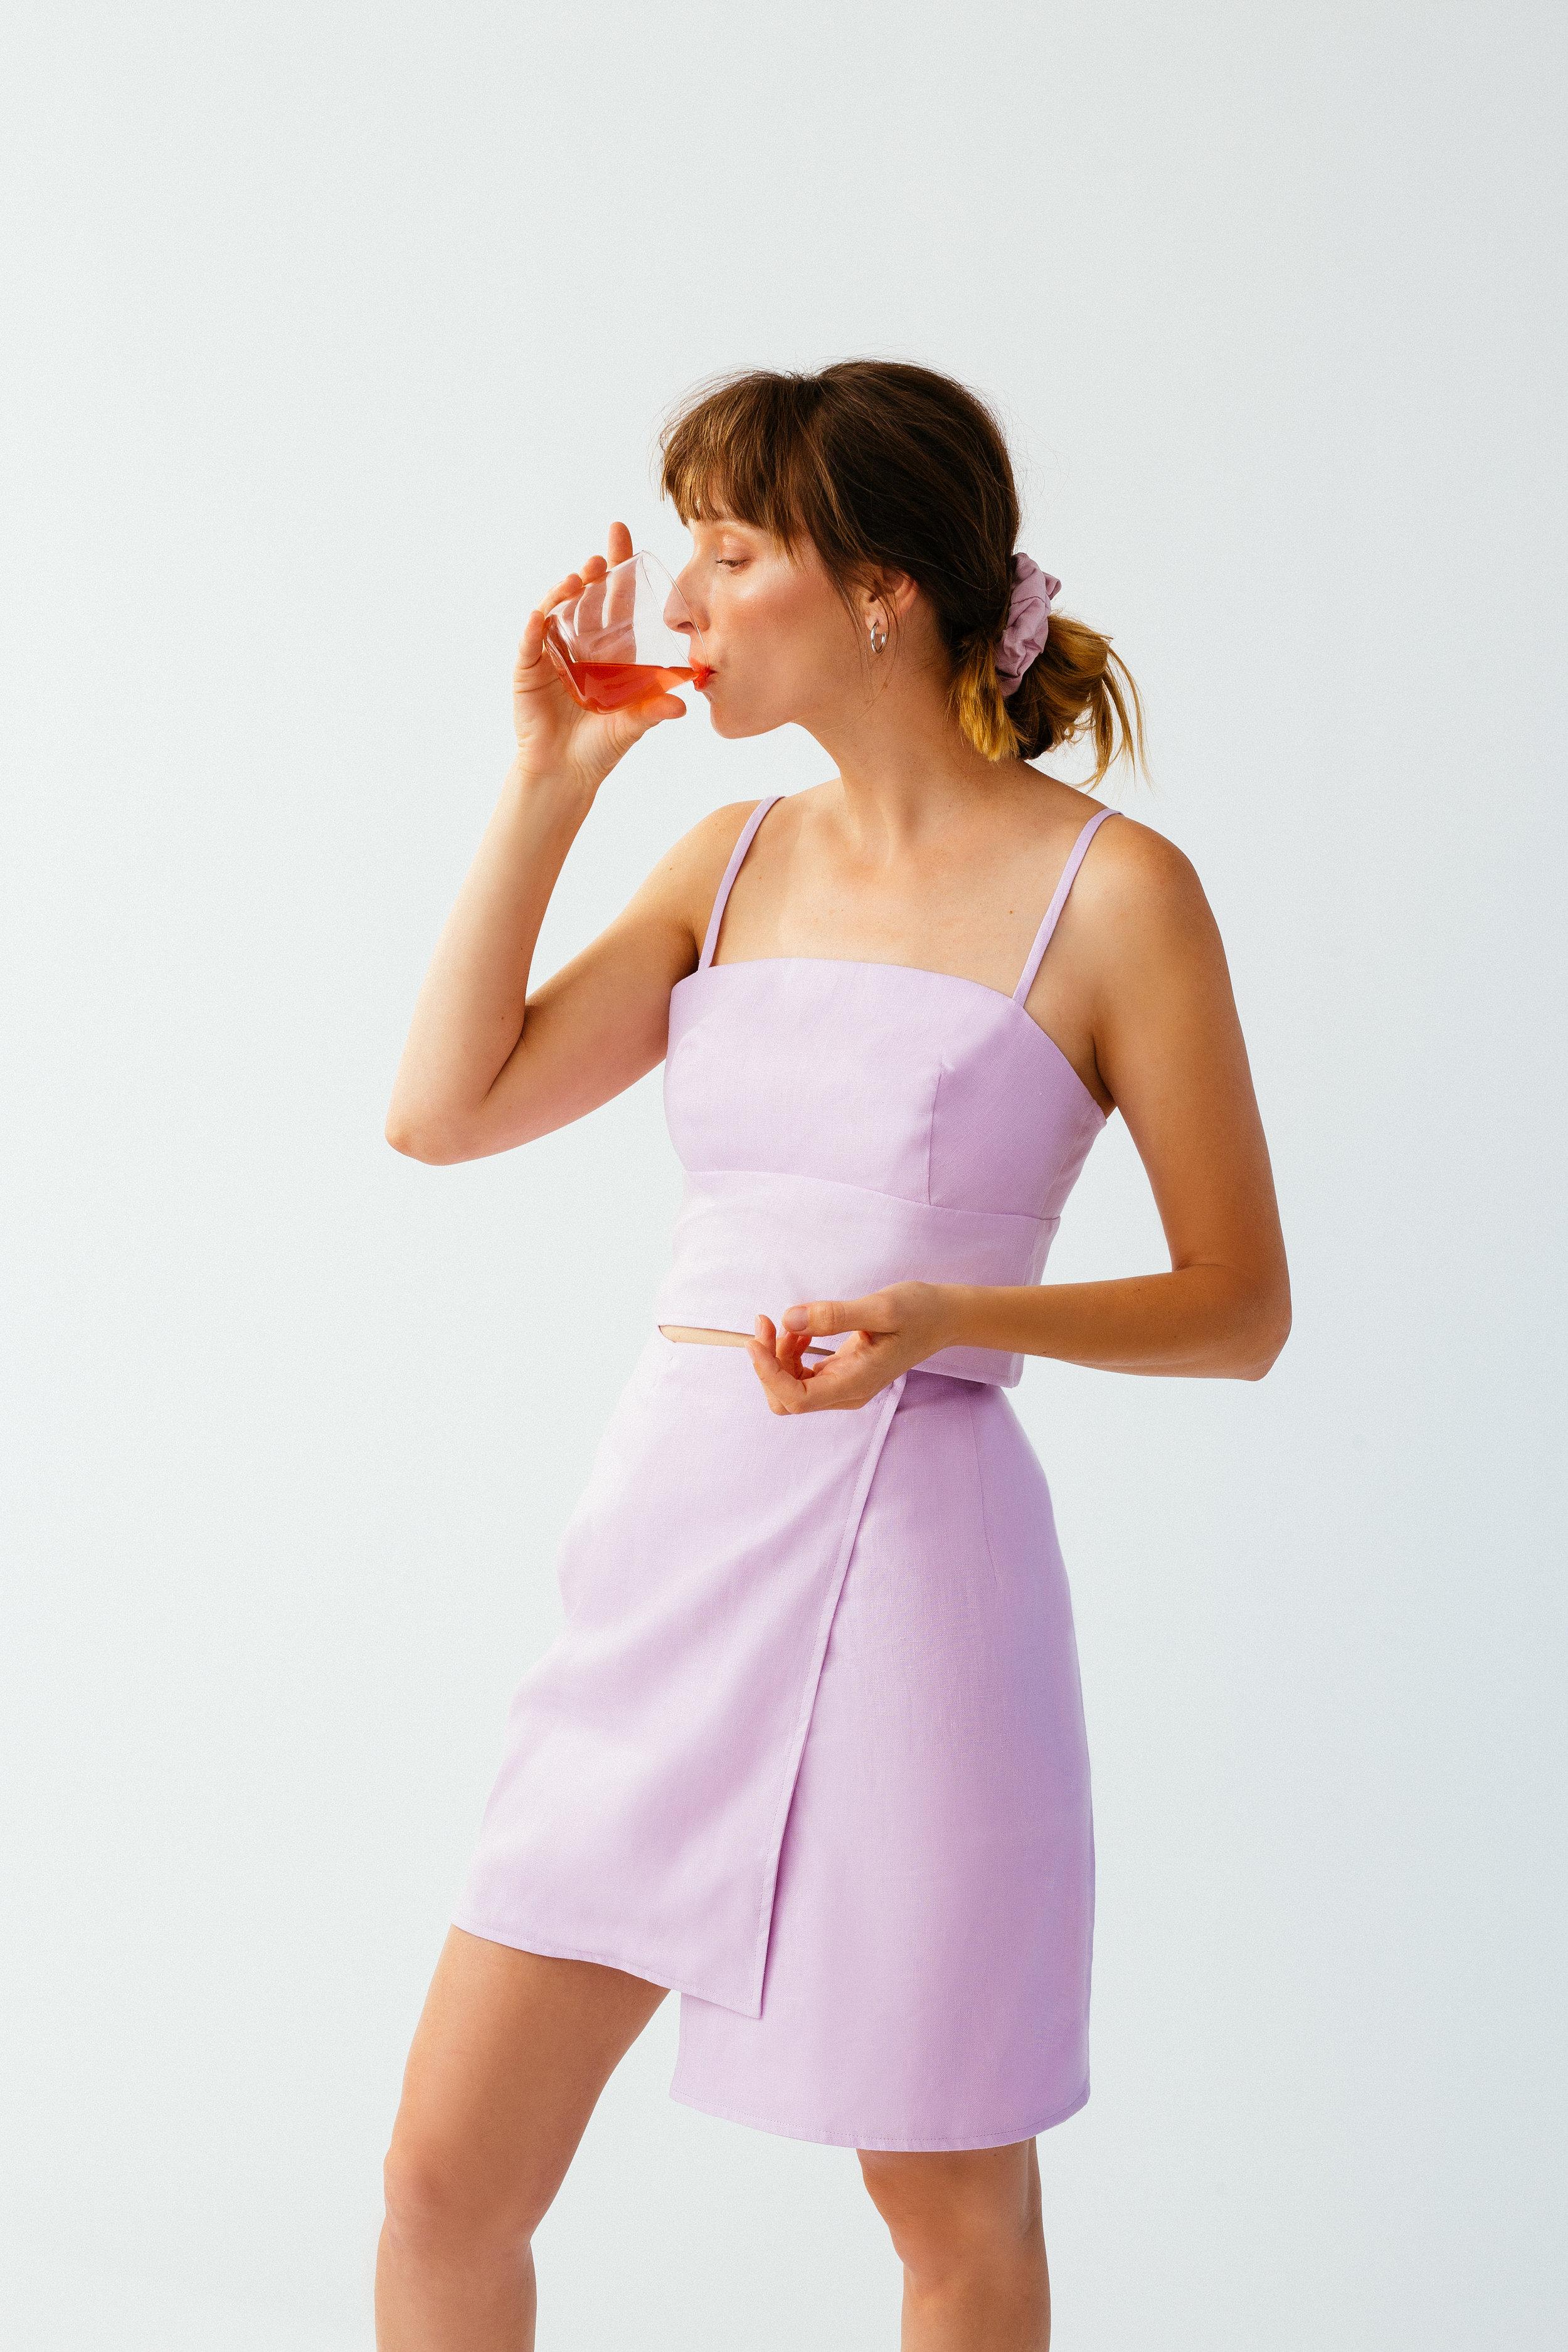 ellice ruiz_sustainable workwear_fashion revolution.jpg